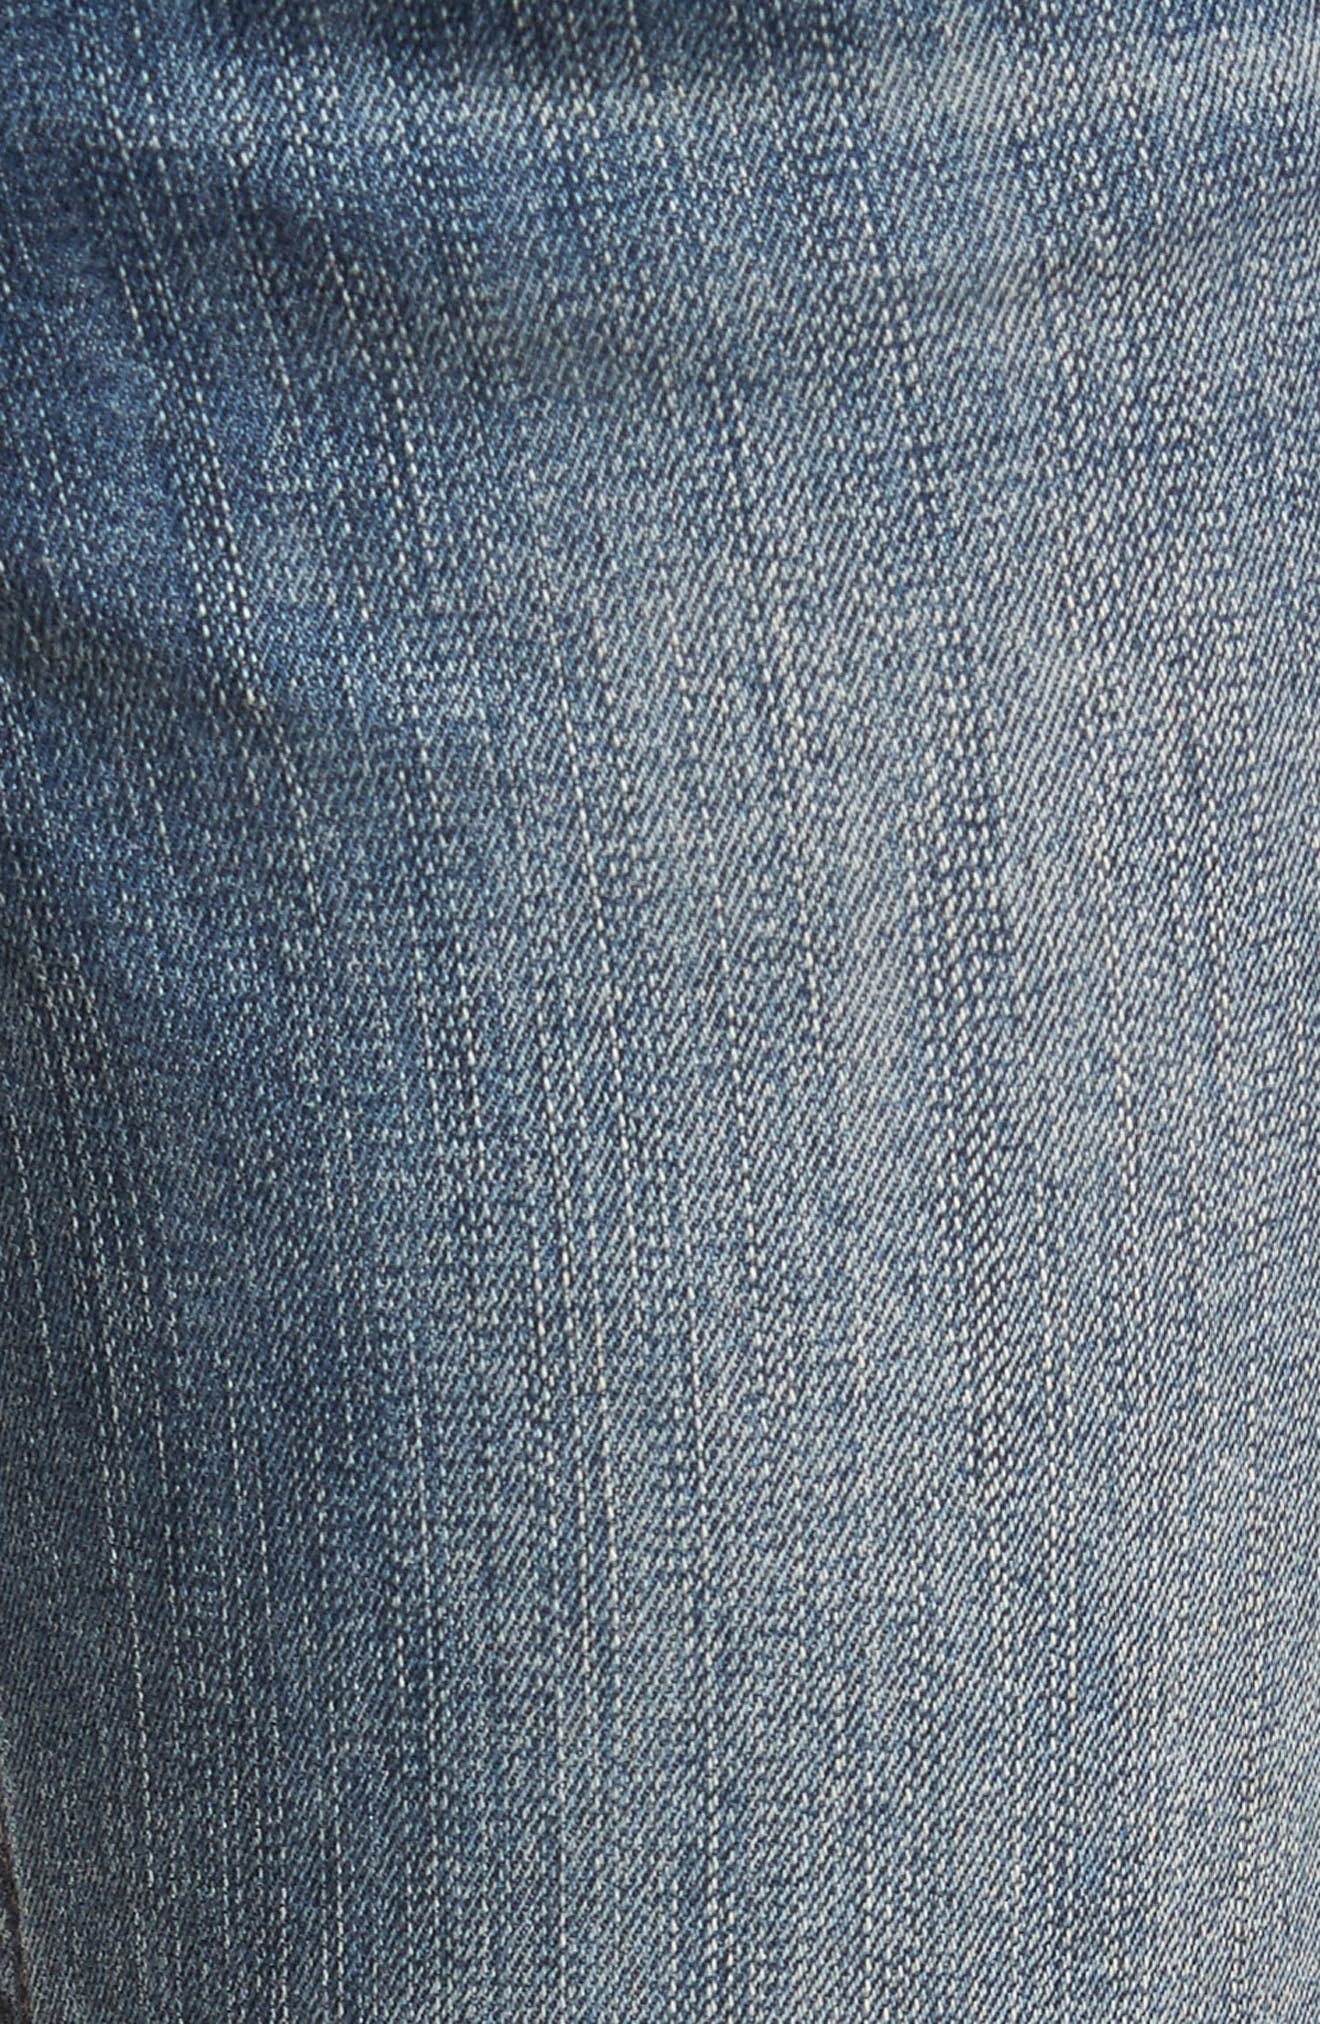 Ankle Skinny Jeans,                             Alternate thumbnail 5, color,                             400